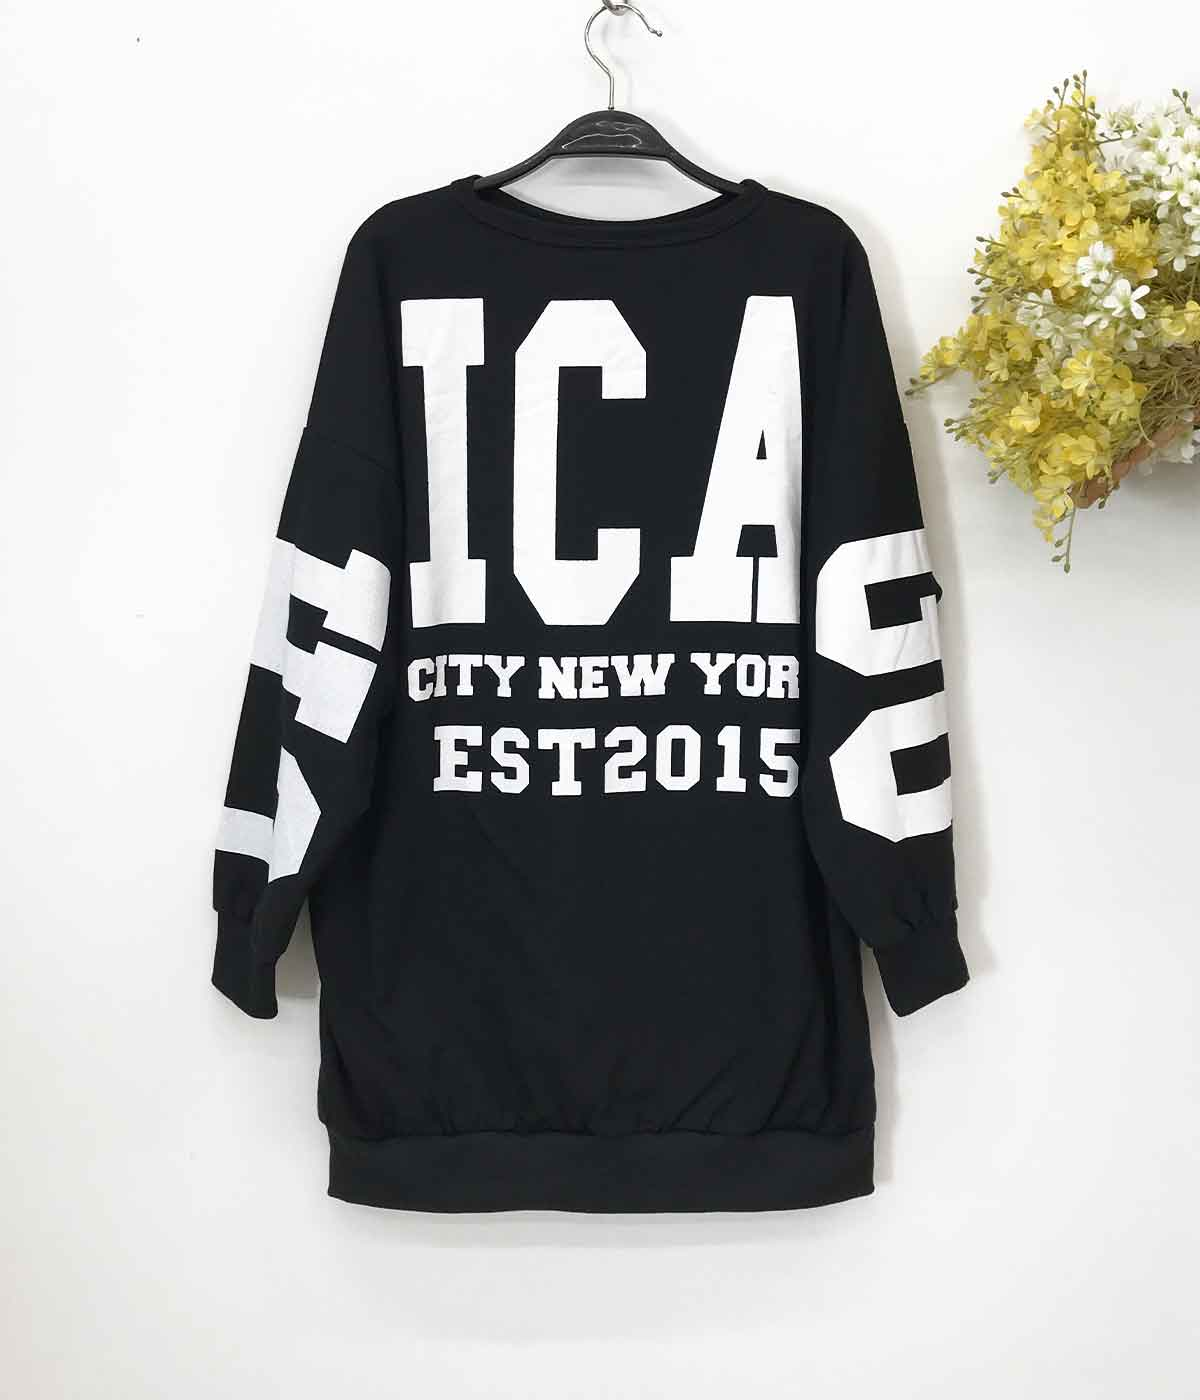 Blusão New York